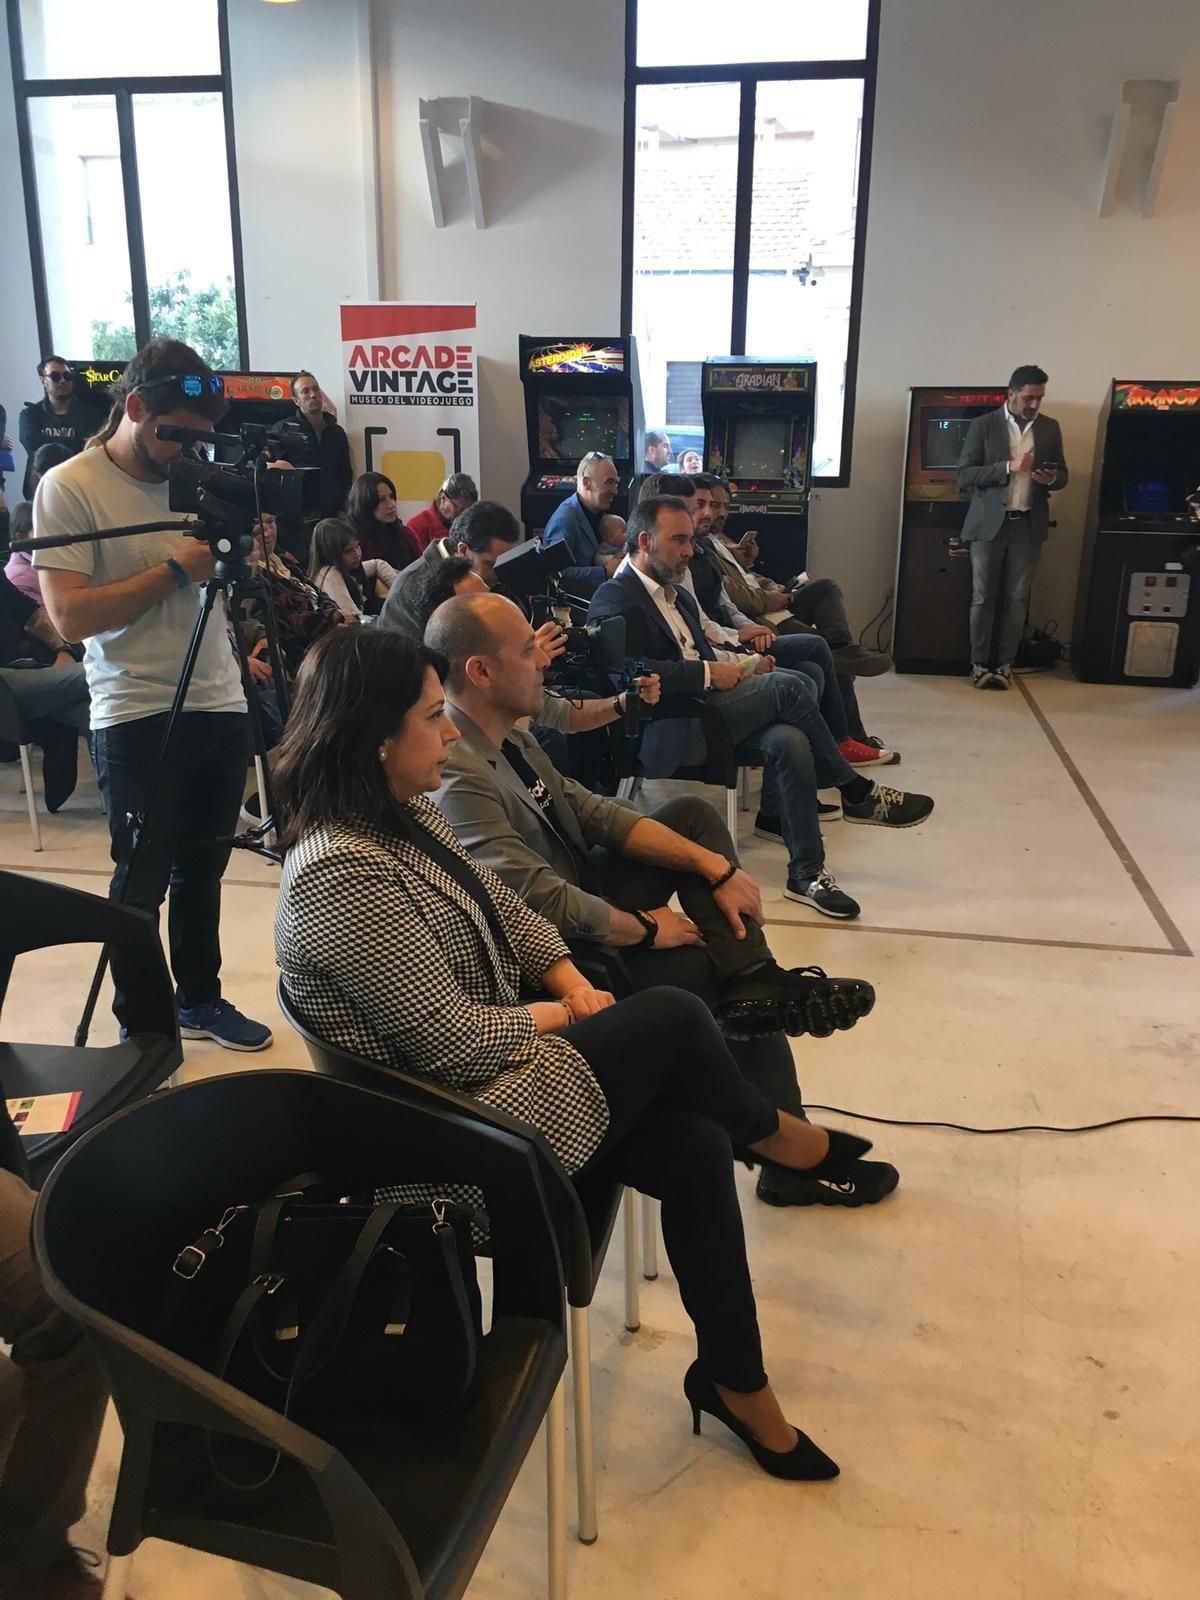 Museum of the video Game Arcade Vintage Ibi will open its doors in June